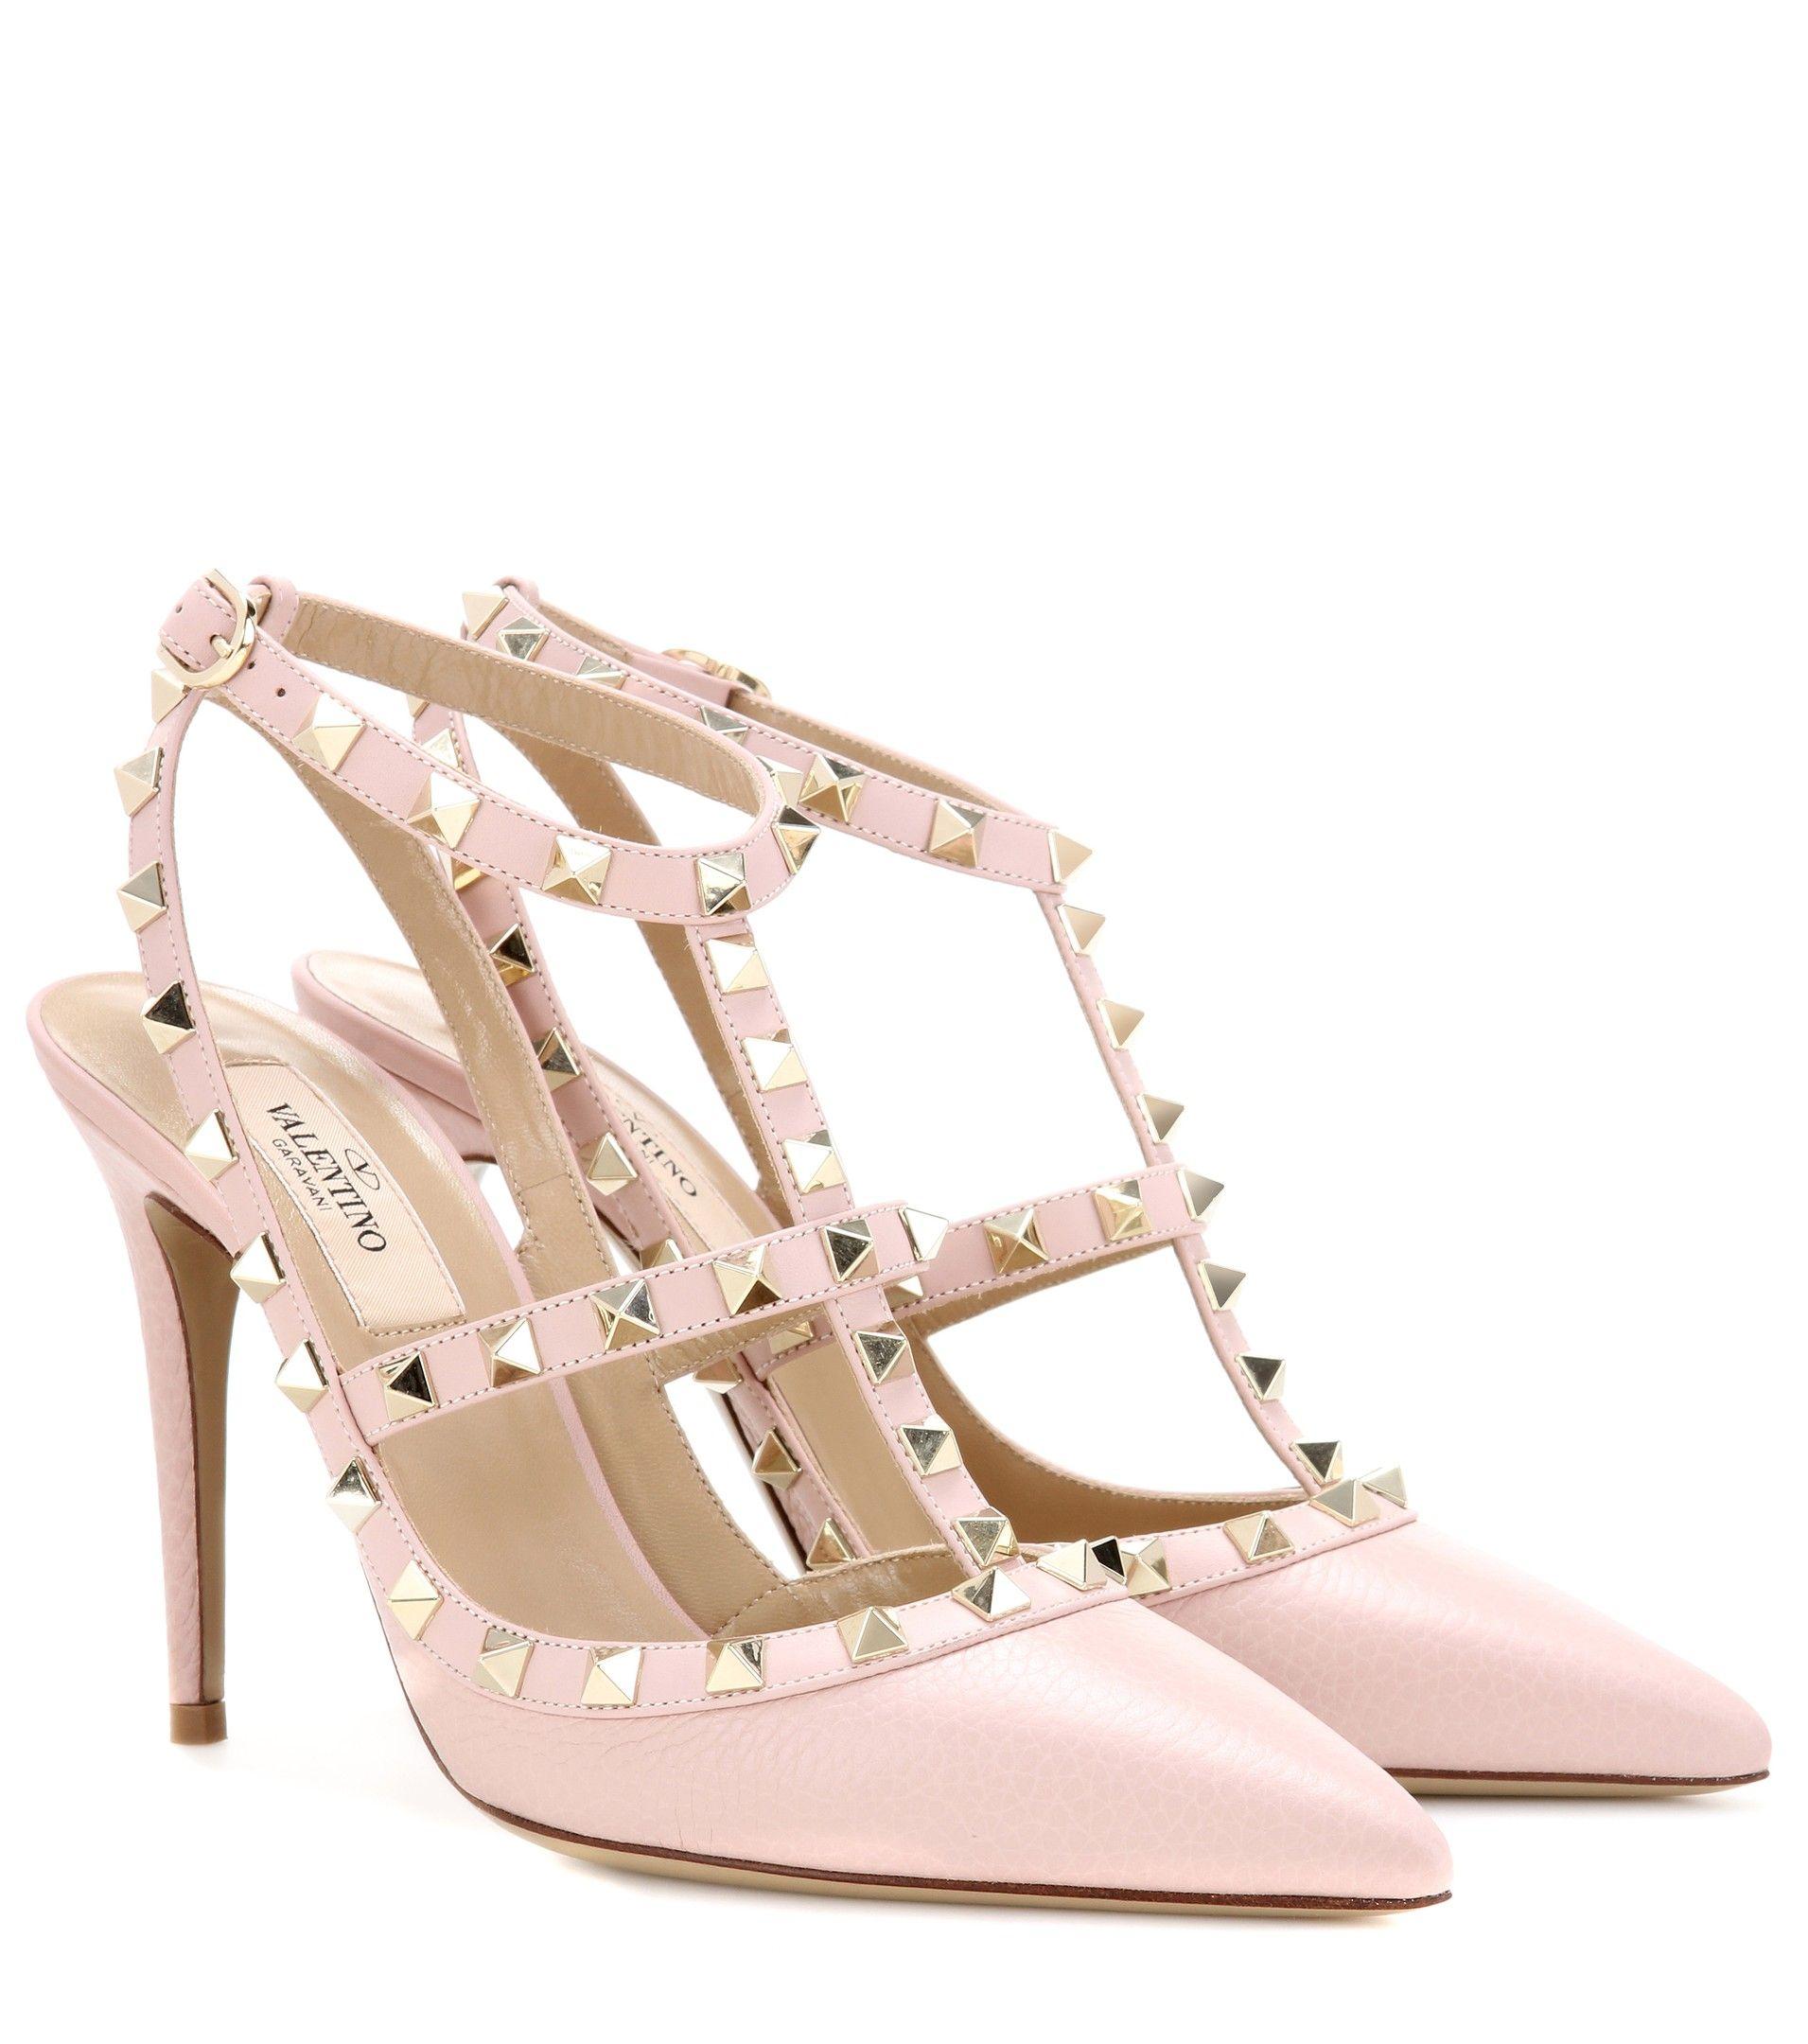 722ad2510 Valentino Rockstud leather 10.5cm pumps Light Pink $149.00 | shose ...